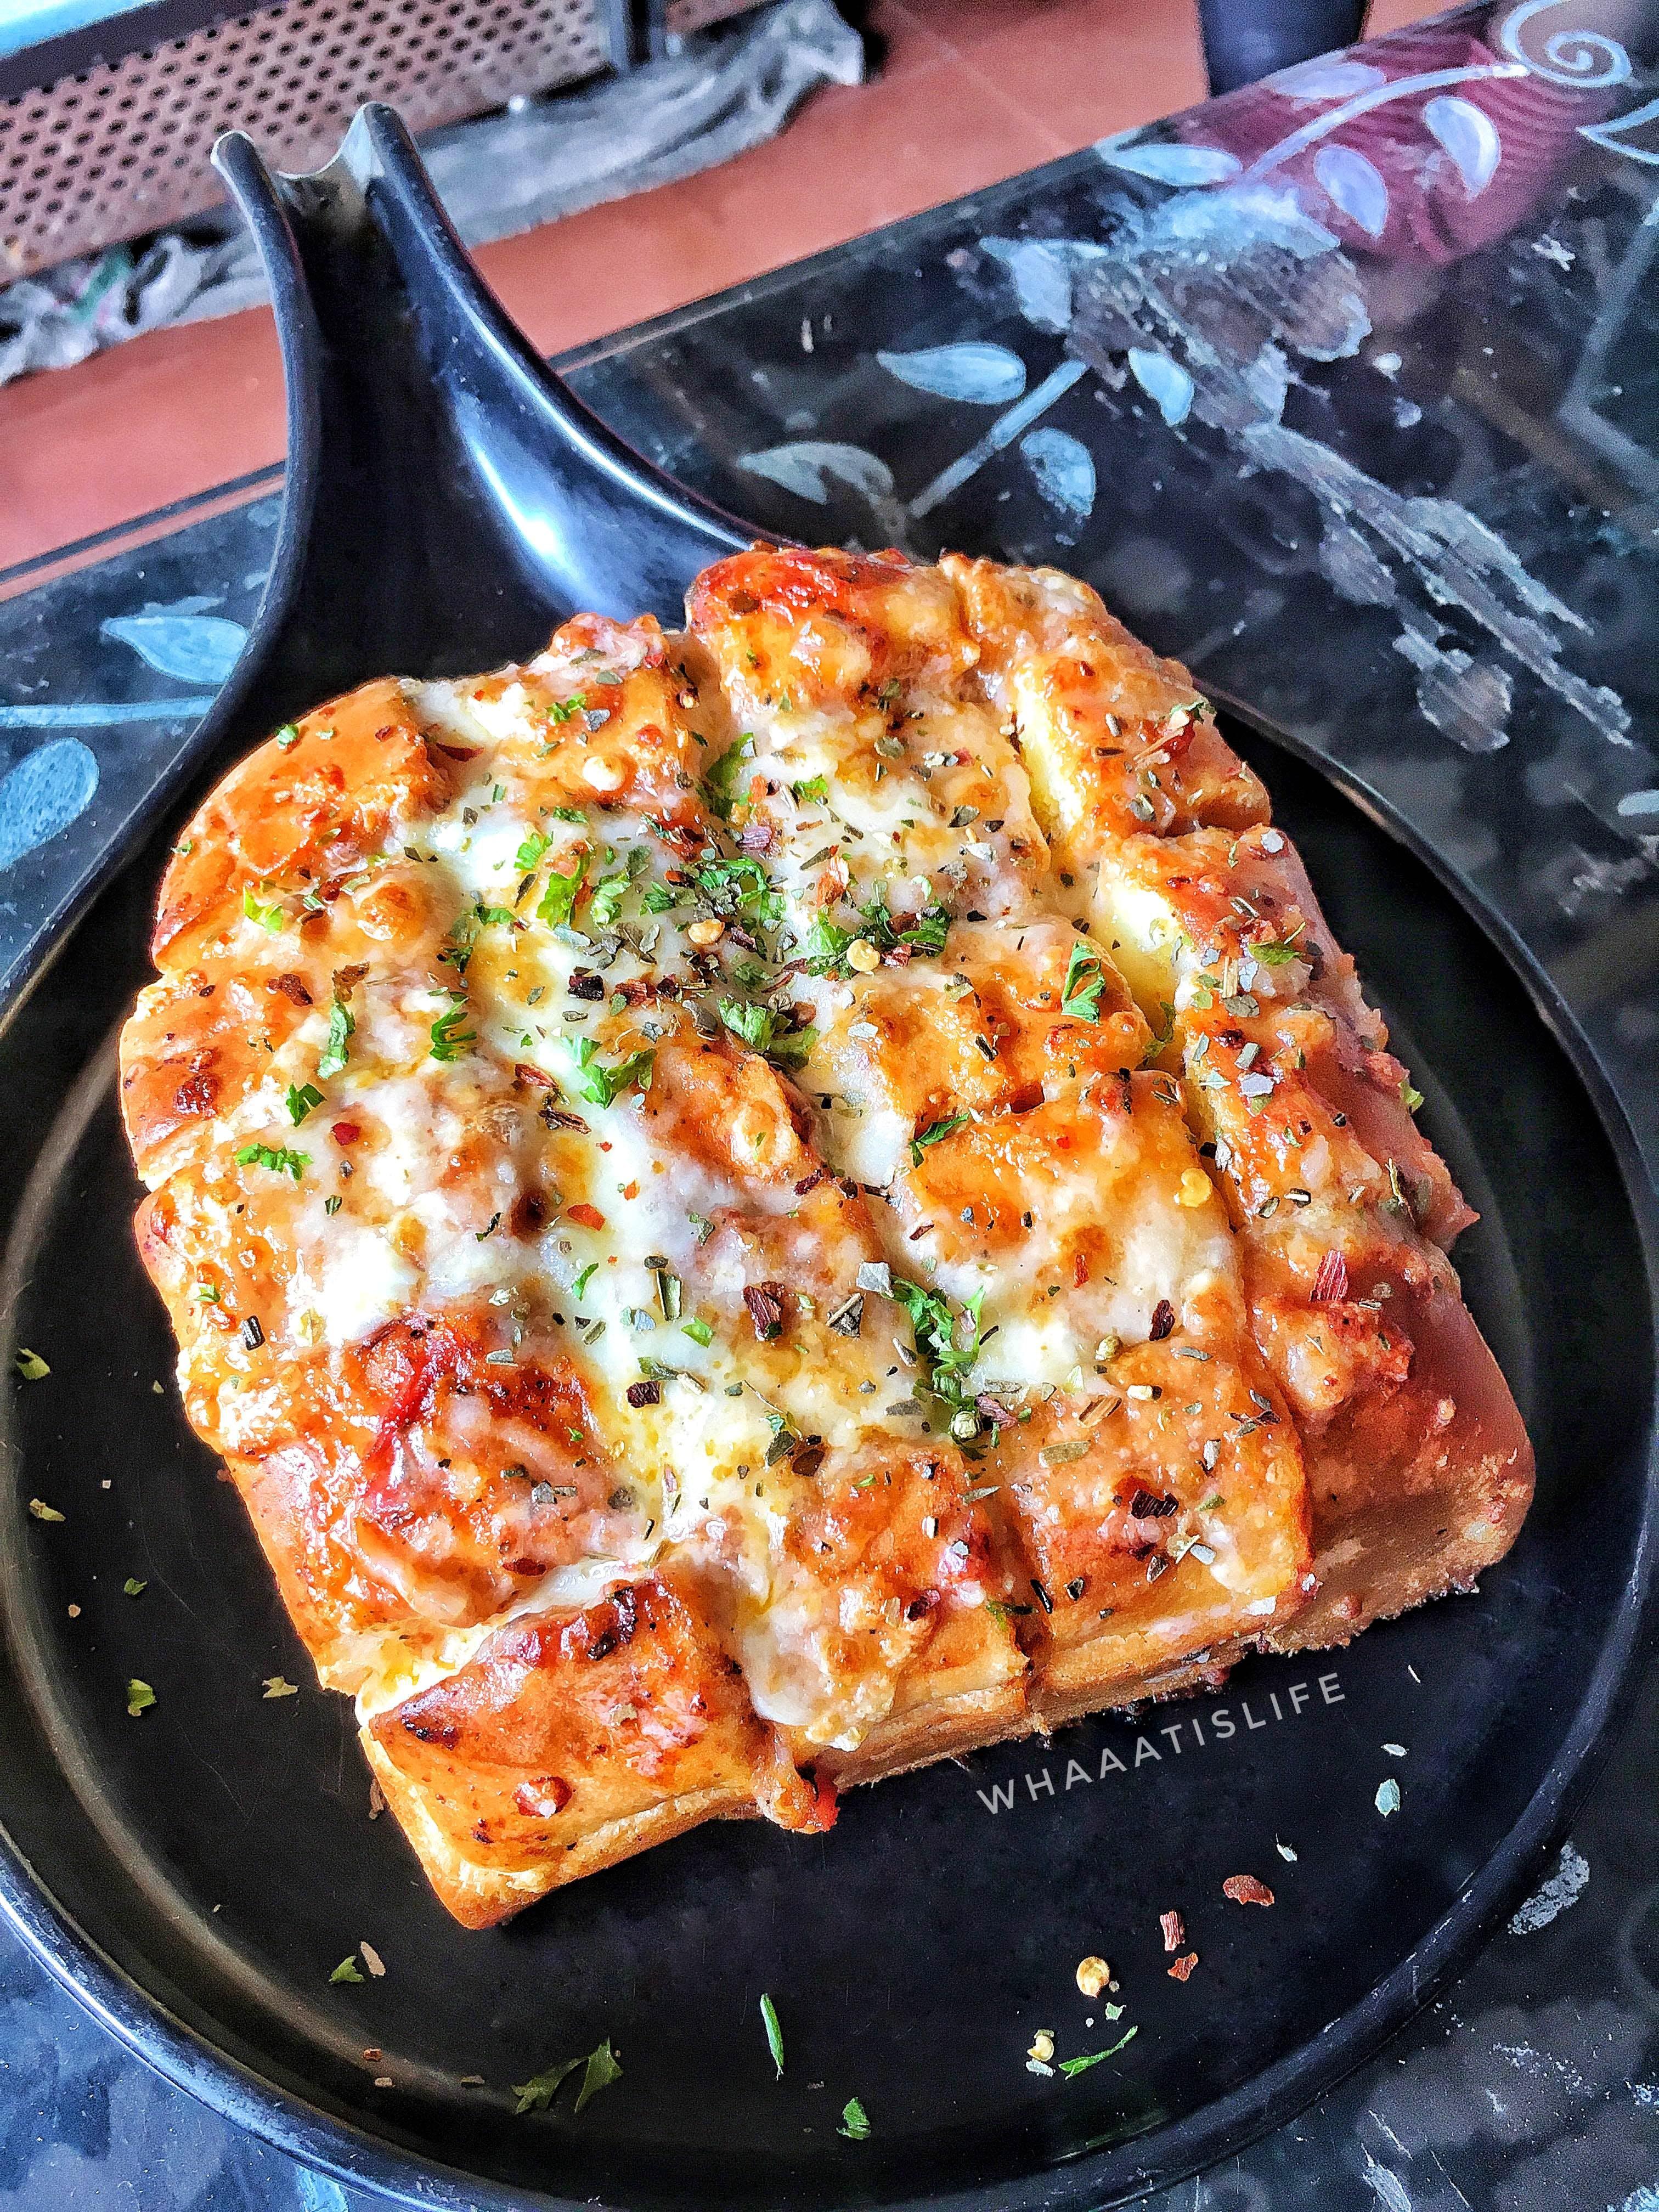 Dish,Food,Cuisine,Pizza cheese,Ingredient,Flatbread,Pizza,Tarte flambée,Produce,Staple food